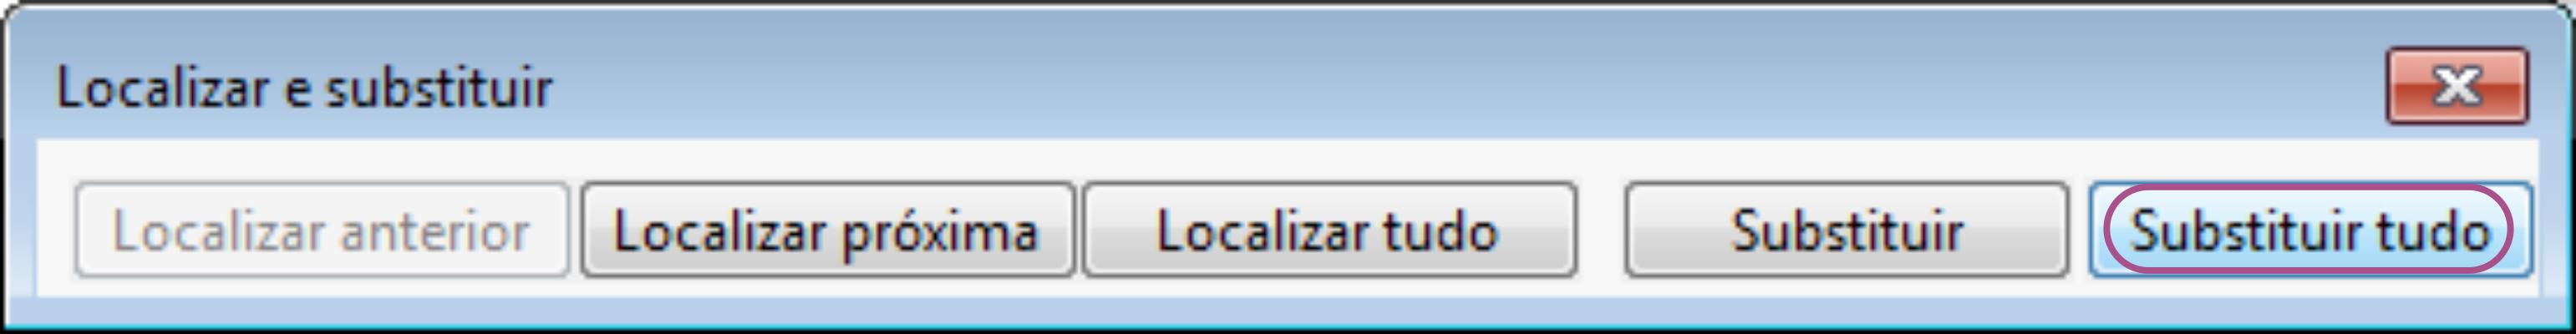 Localizar_1